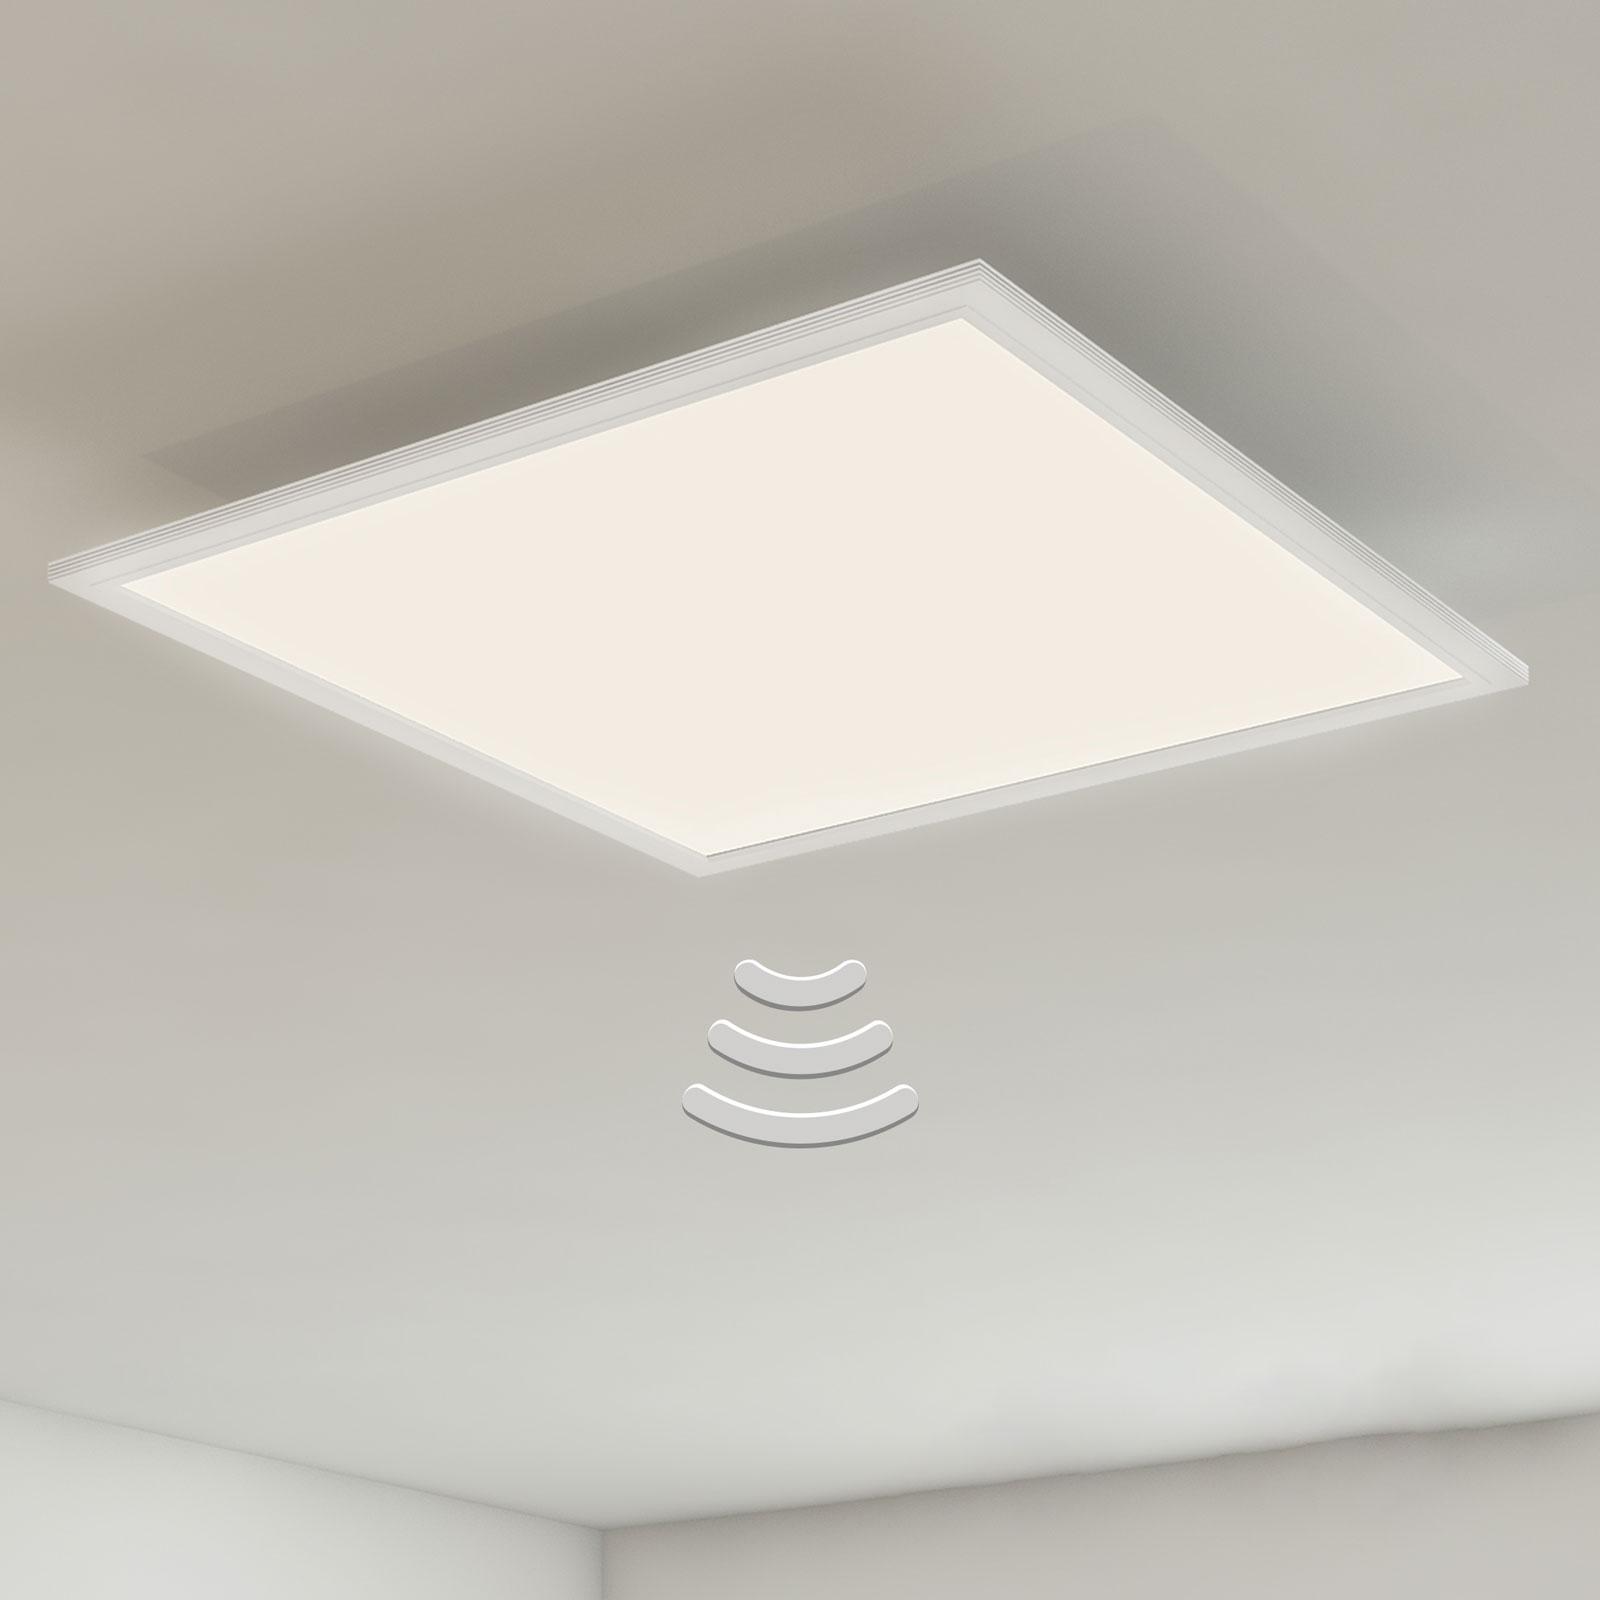 LED-kattovalaisin 7188-016, tunnistin, 59,5x59,5cm